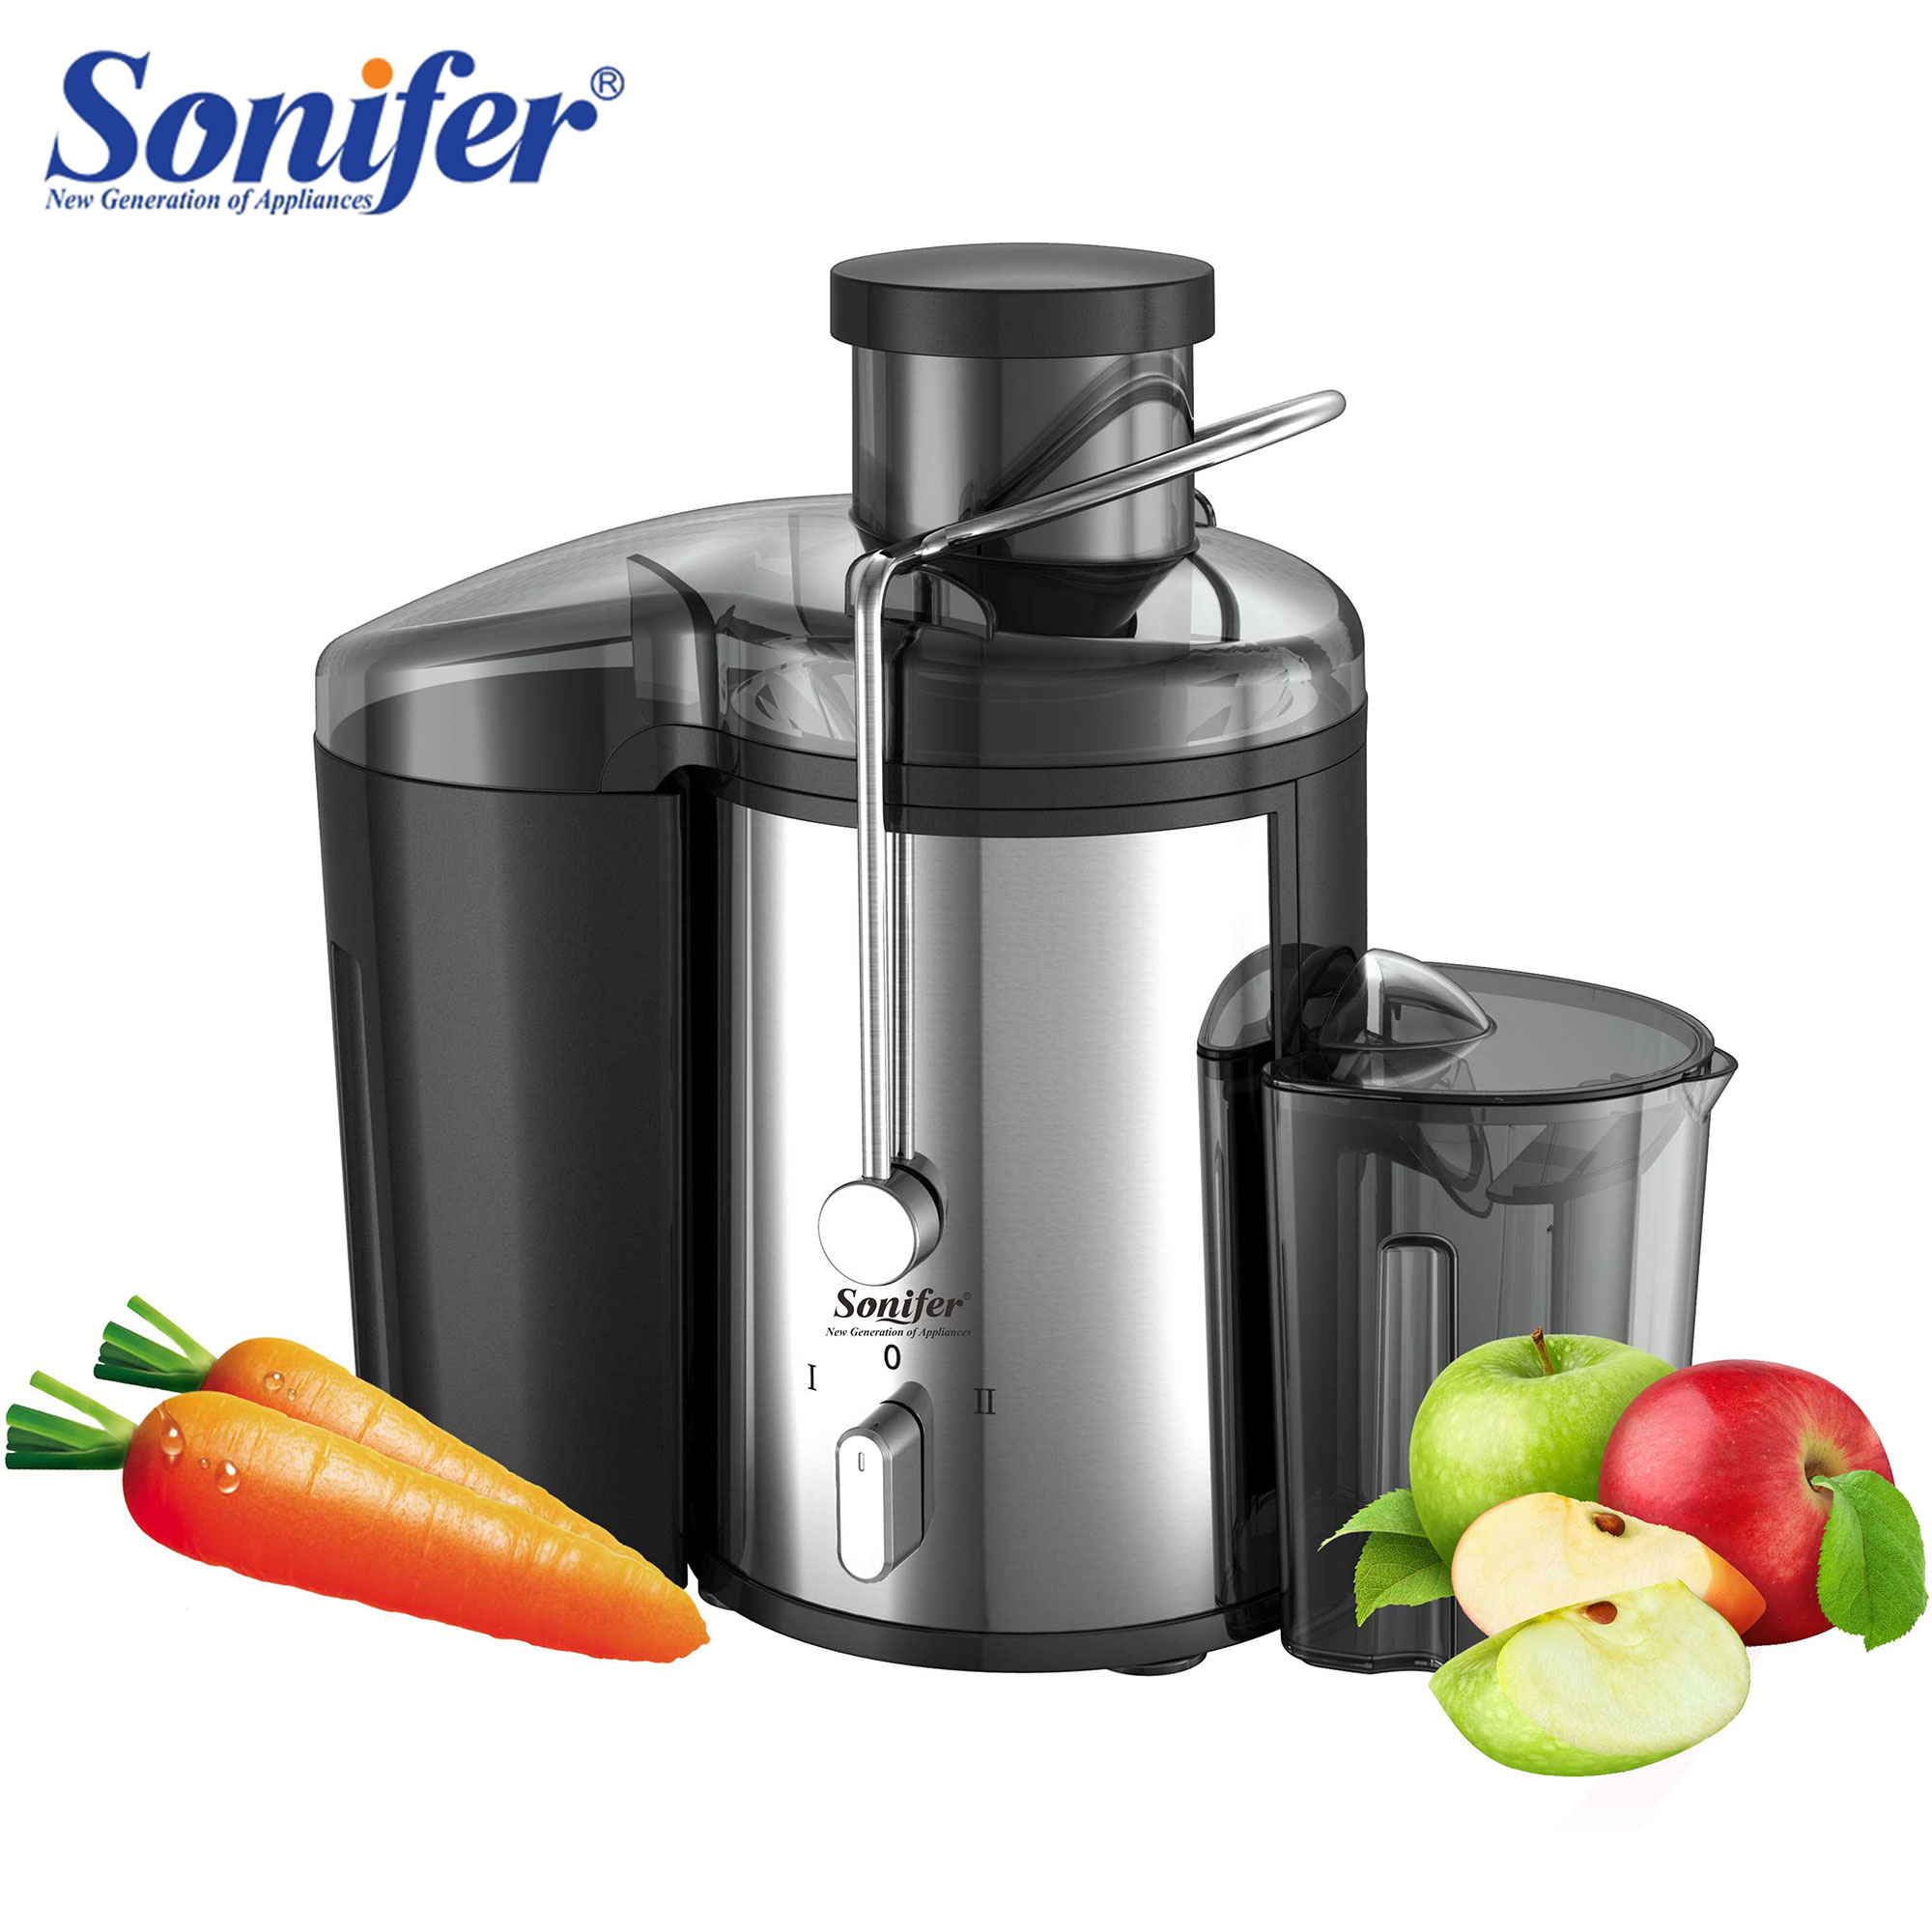 220V Rvs Sapcentrifuge 2 Speed Elektrische Sapcentrifuge Fruit Drinken Machine voor Thuis Sonifer-in Juicers van Huishoudelijk Apparatuur op  Groep 1